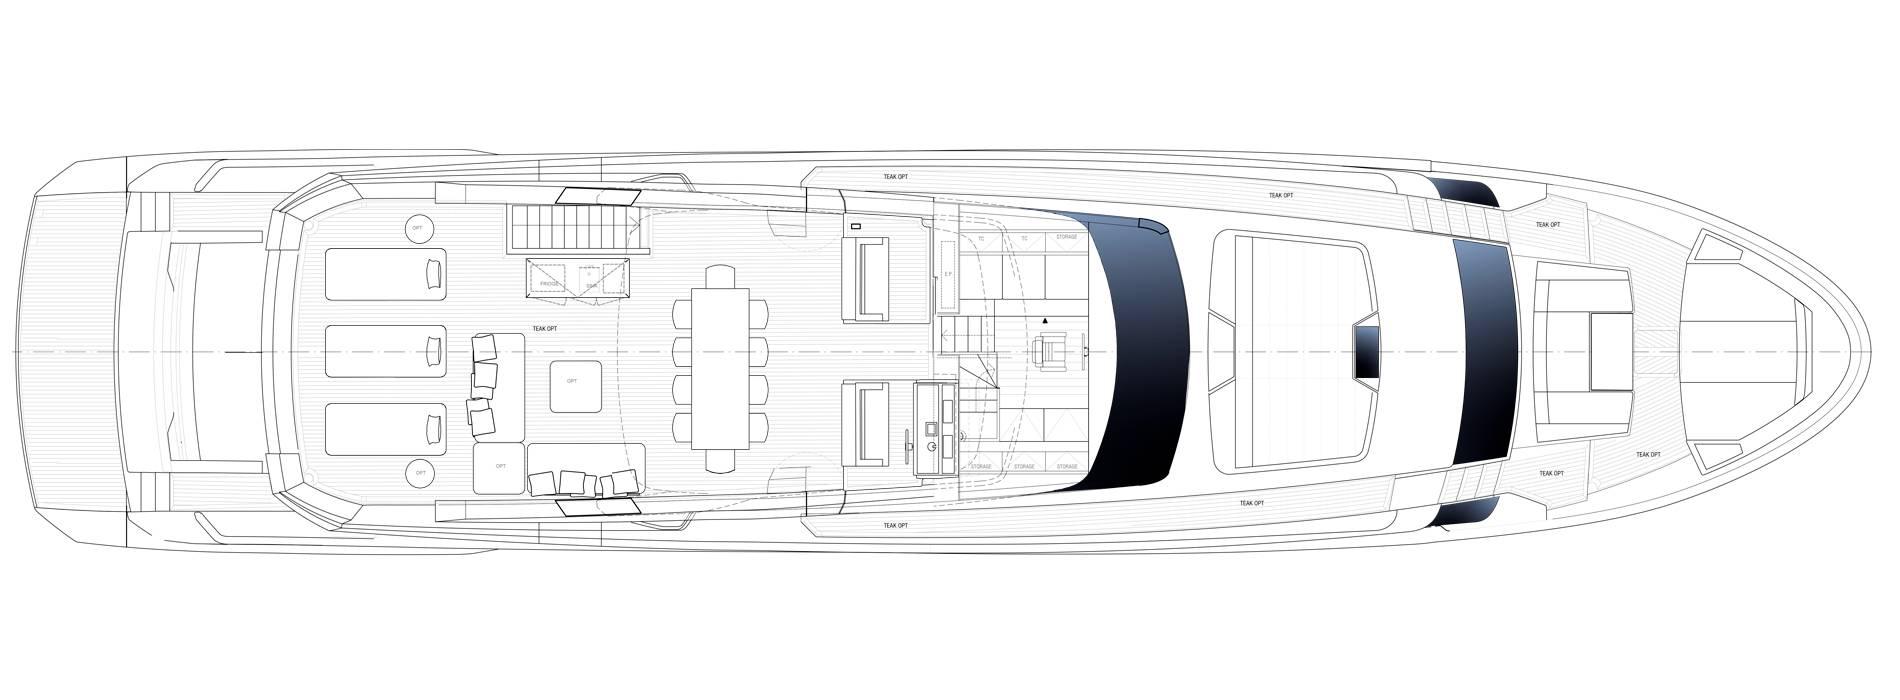 Sanlorenzo Yachts SL106 Asymmetric Флайбридж